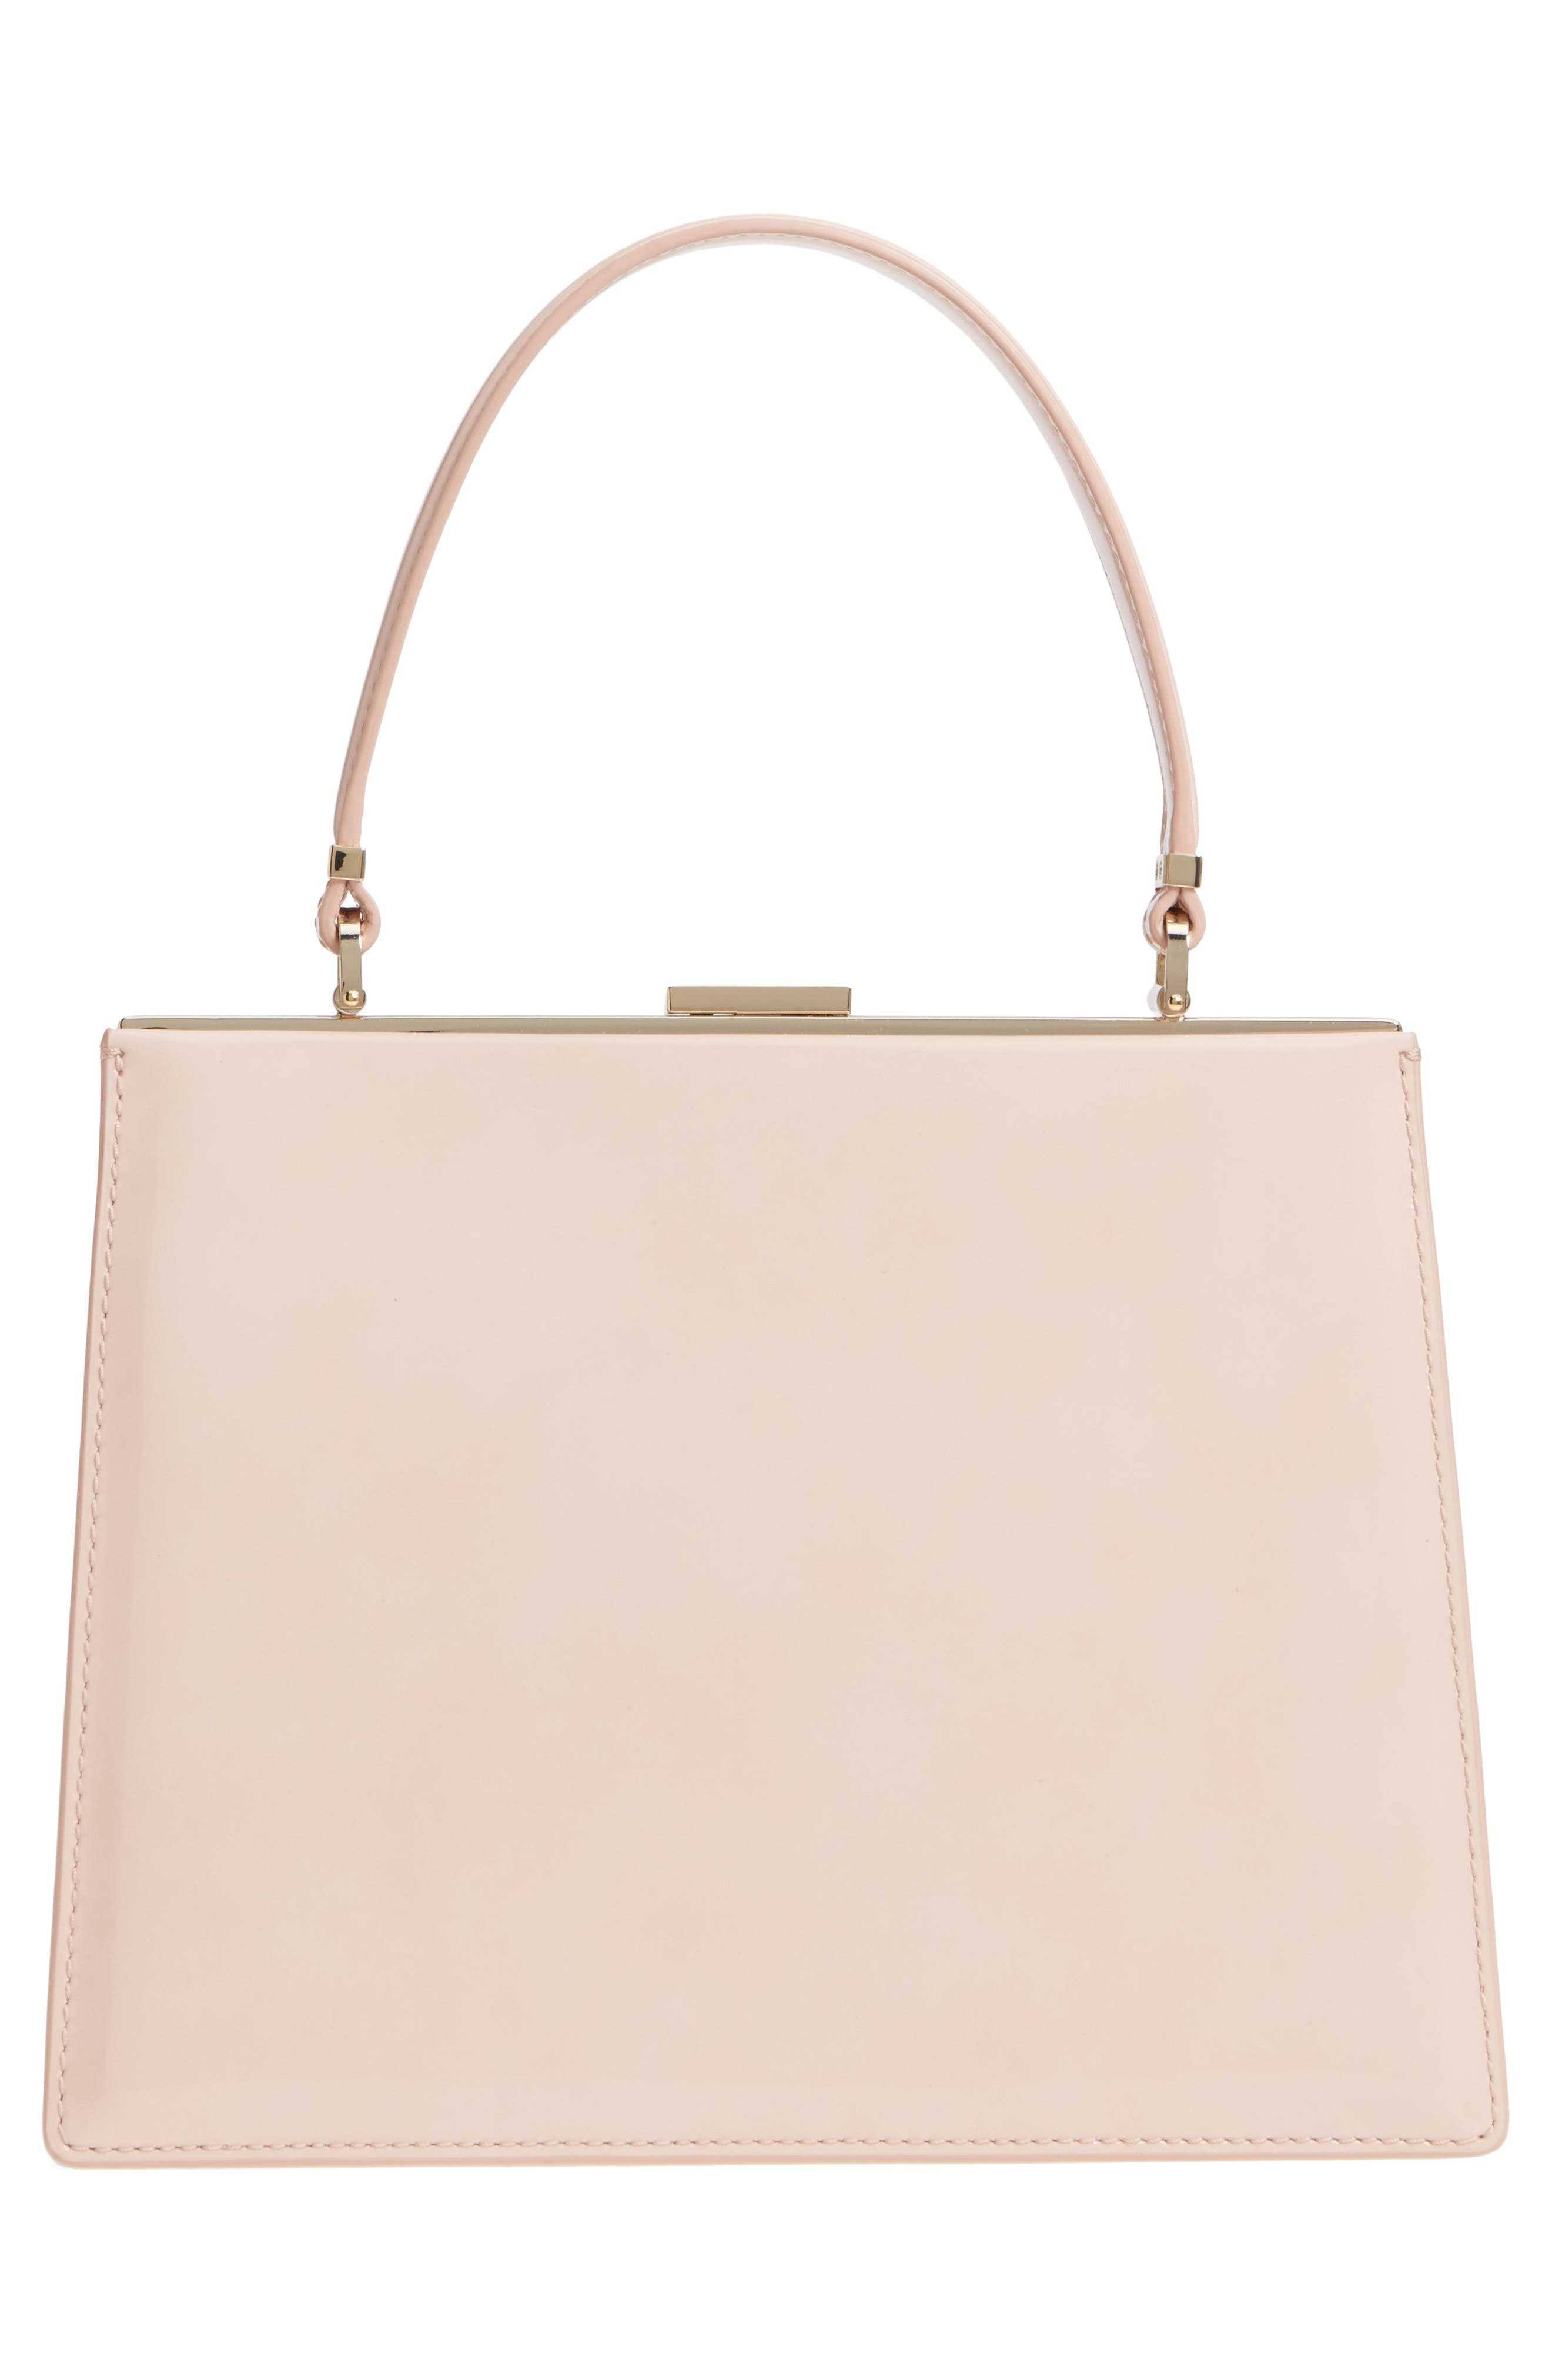 madison moore road - chari leather handbag,                             Alternate thumbnail 3, color,                             Sand Flat